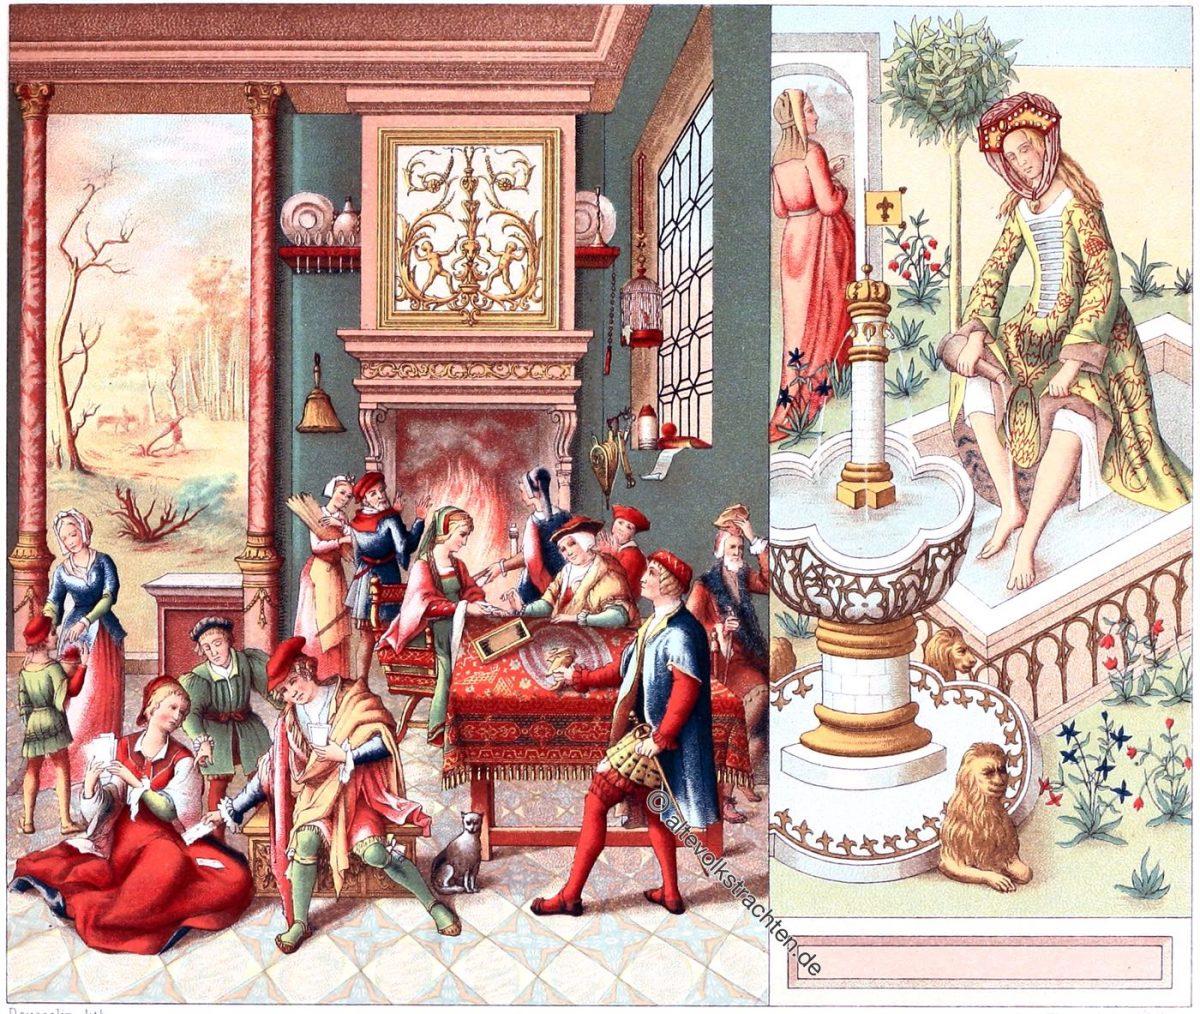 INNERES DES SCHLOSSES: DER SAAL. DIE KÖRPERPFLEGE.  Europa. XV. XVI. Jahrhundert.